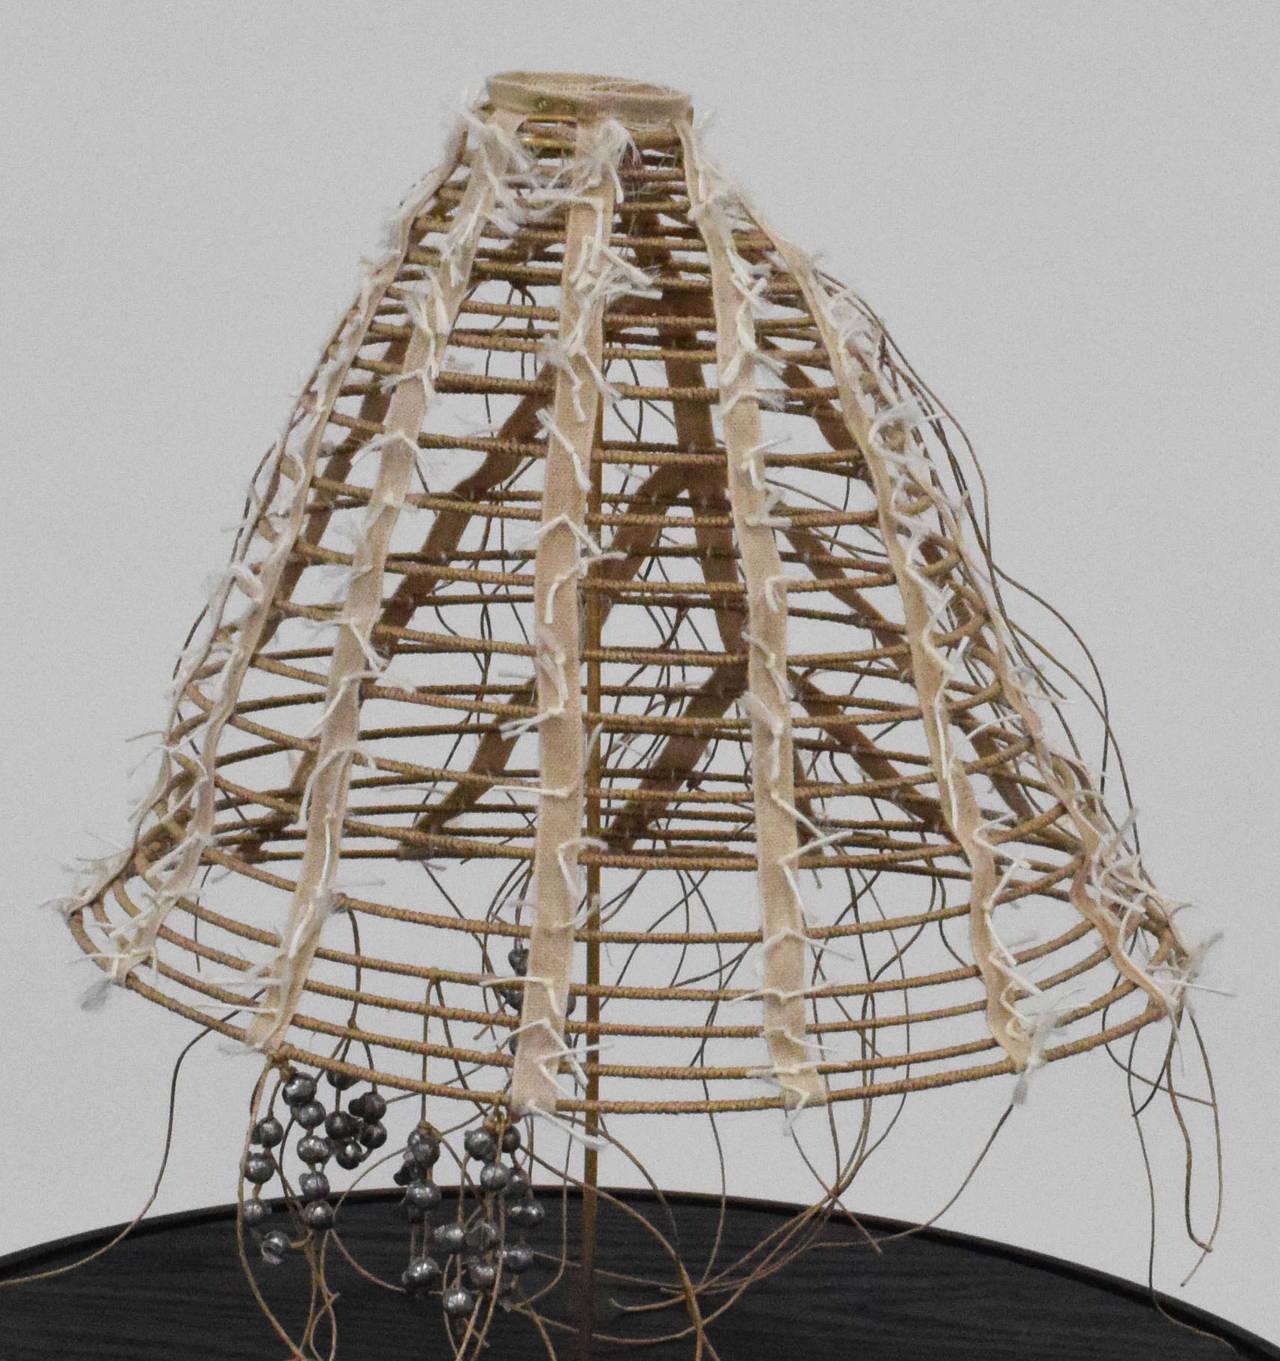 3ed1b906c24 Holly Laws Figurative Sculpture - Cage Crinoline 1865